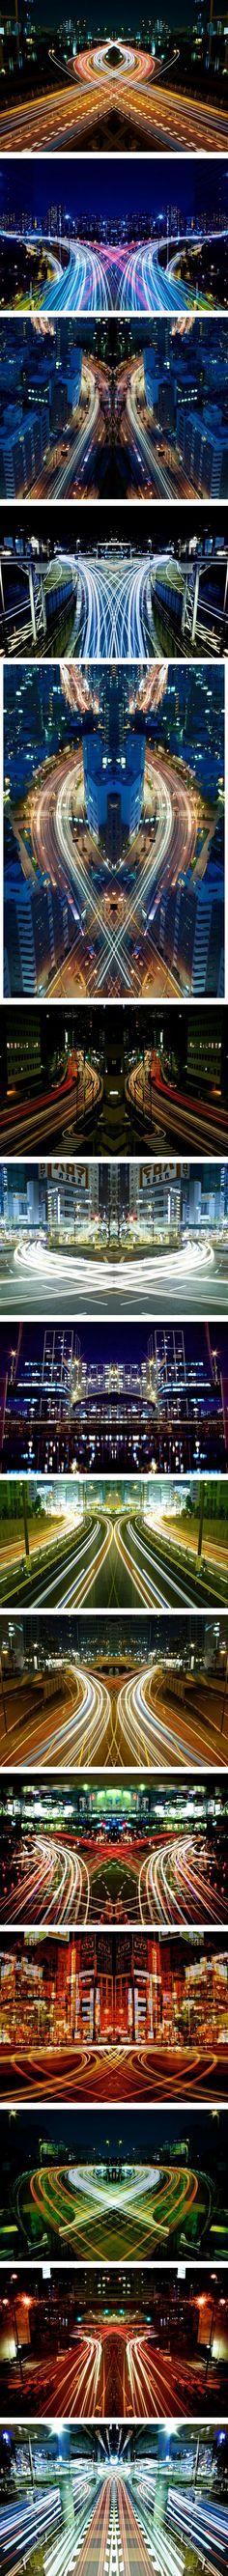 """Graffiti of Speed"" Symmetric Long Exposure Photography by Shinichi Higashi"